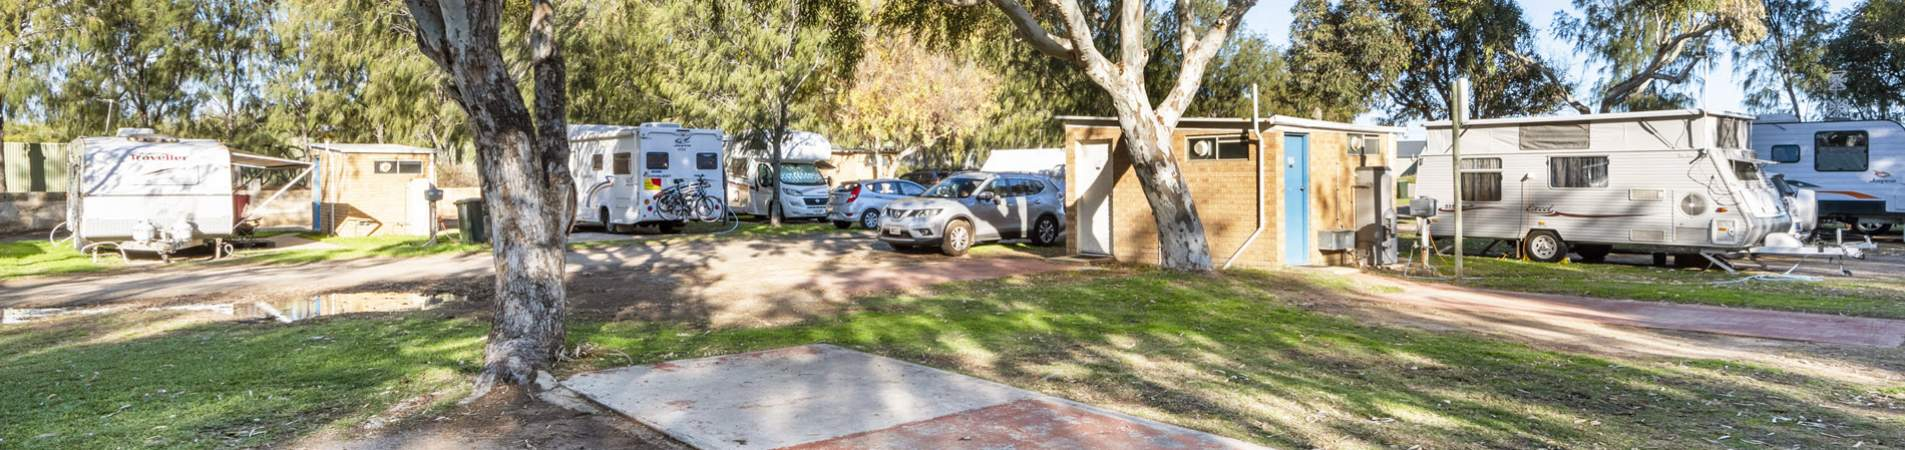 geraldton belair gardens caravan park accommodation - banner 4